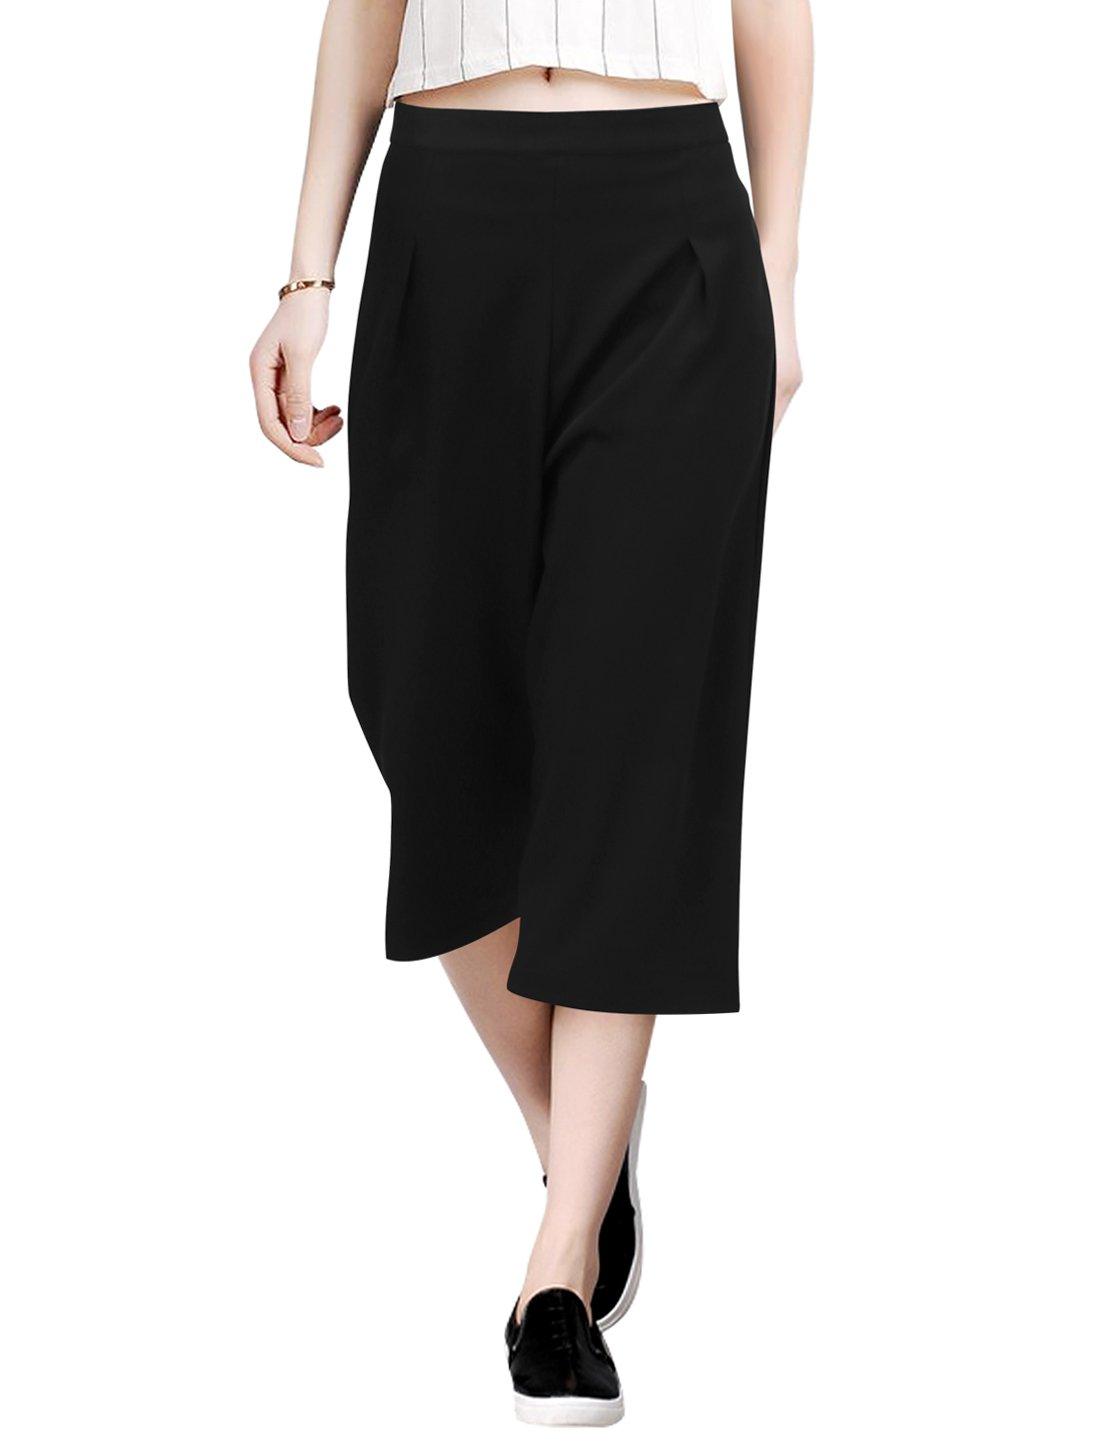 Allegra K Ladies Concealed Zipper Capris Culottes Pants M Black